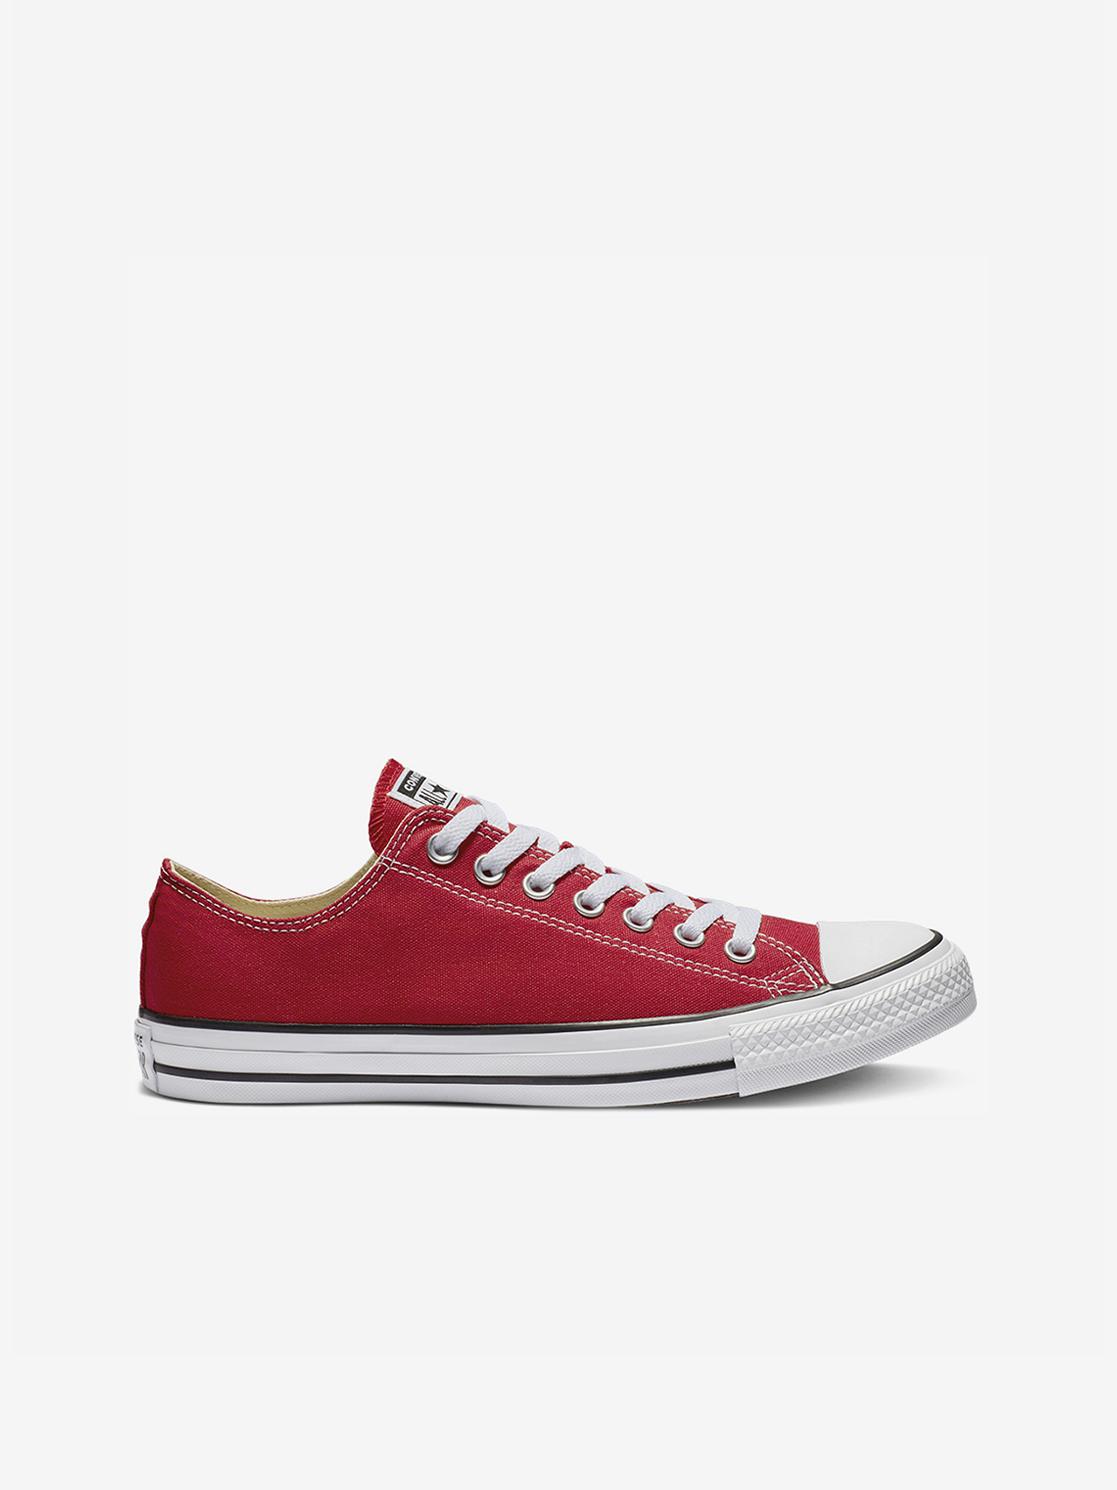 Converse červené tenisky Chuck Taylor All Star Classic Colors ... 430df7a5e15